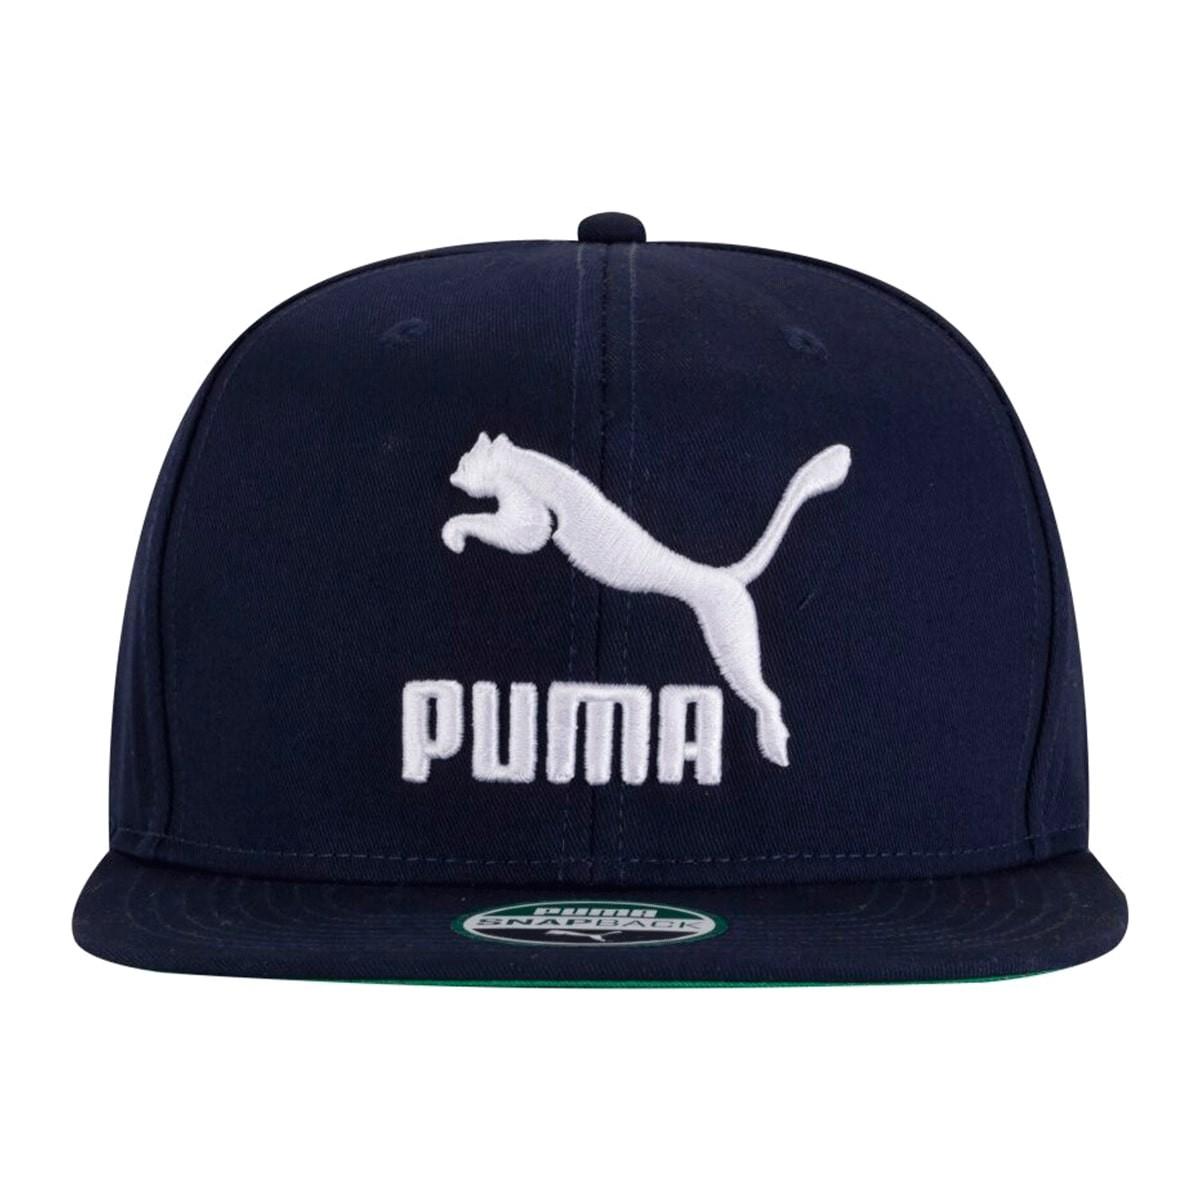 Boné Puma Aba Reta LS Colour Block Azul